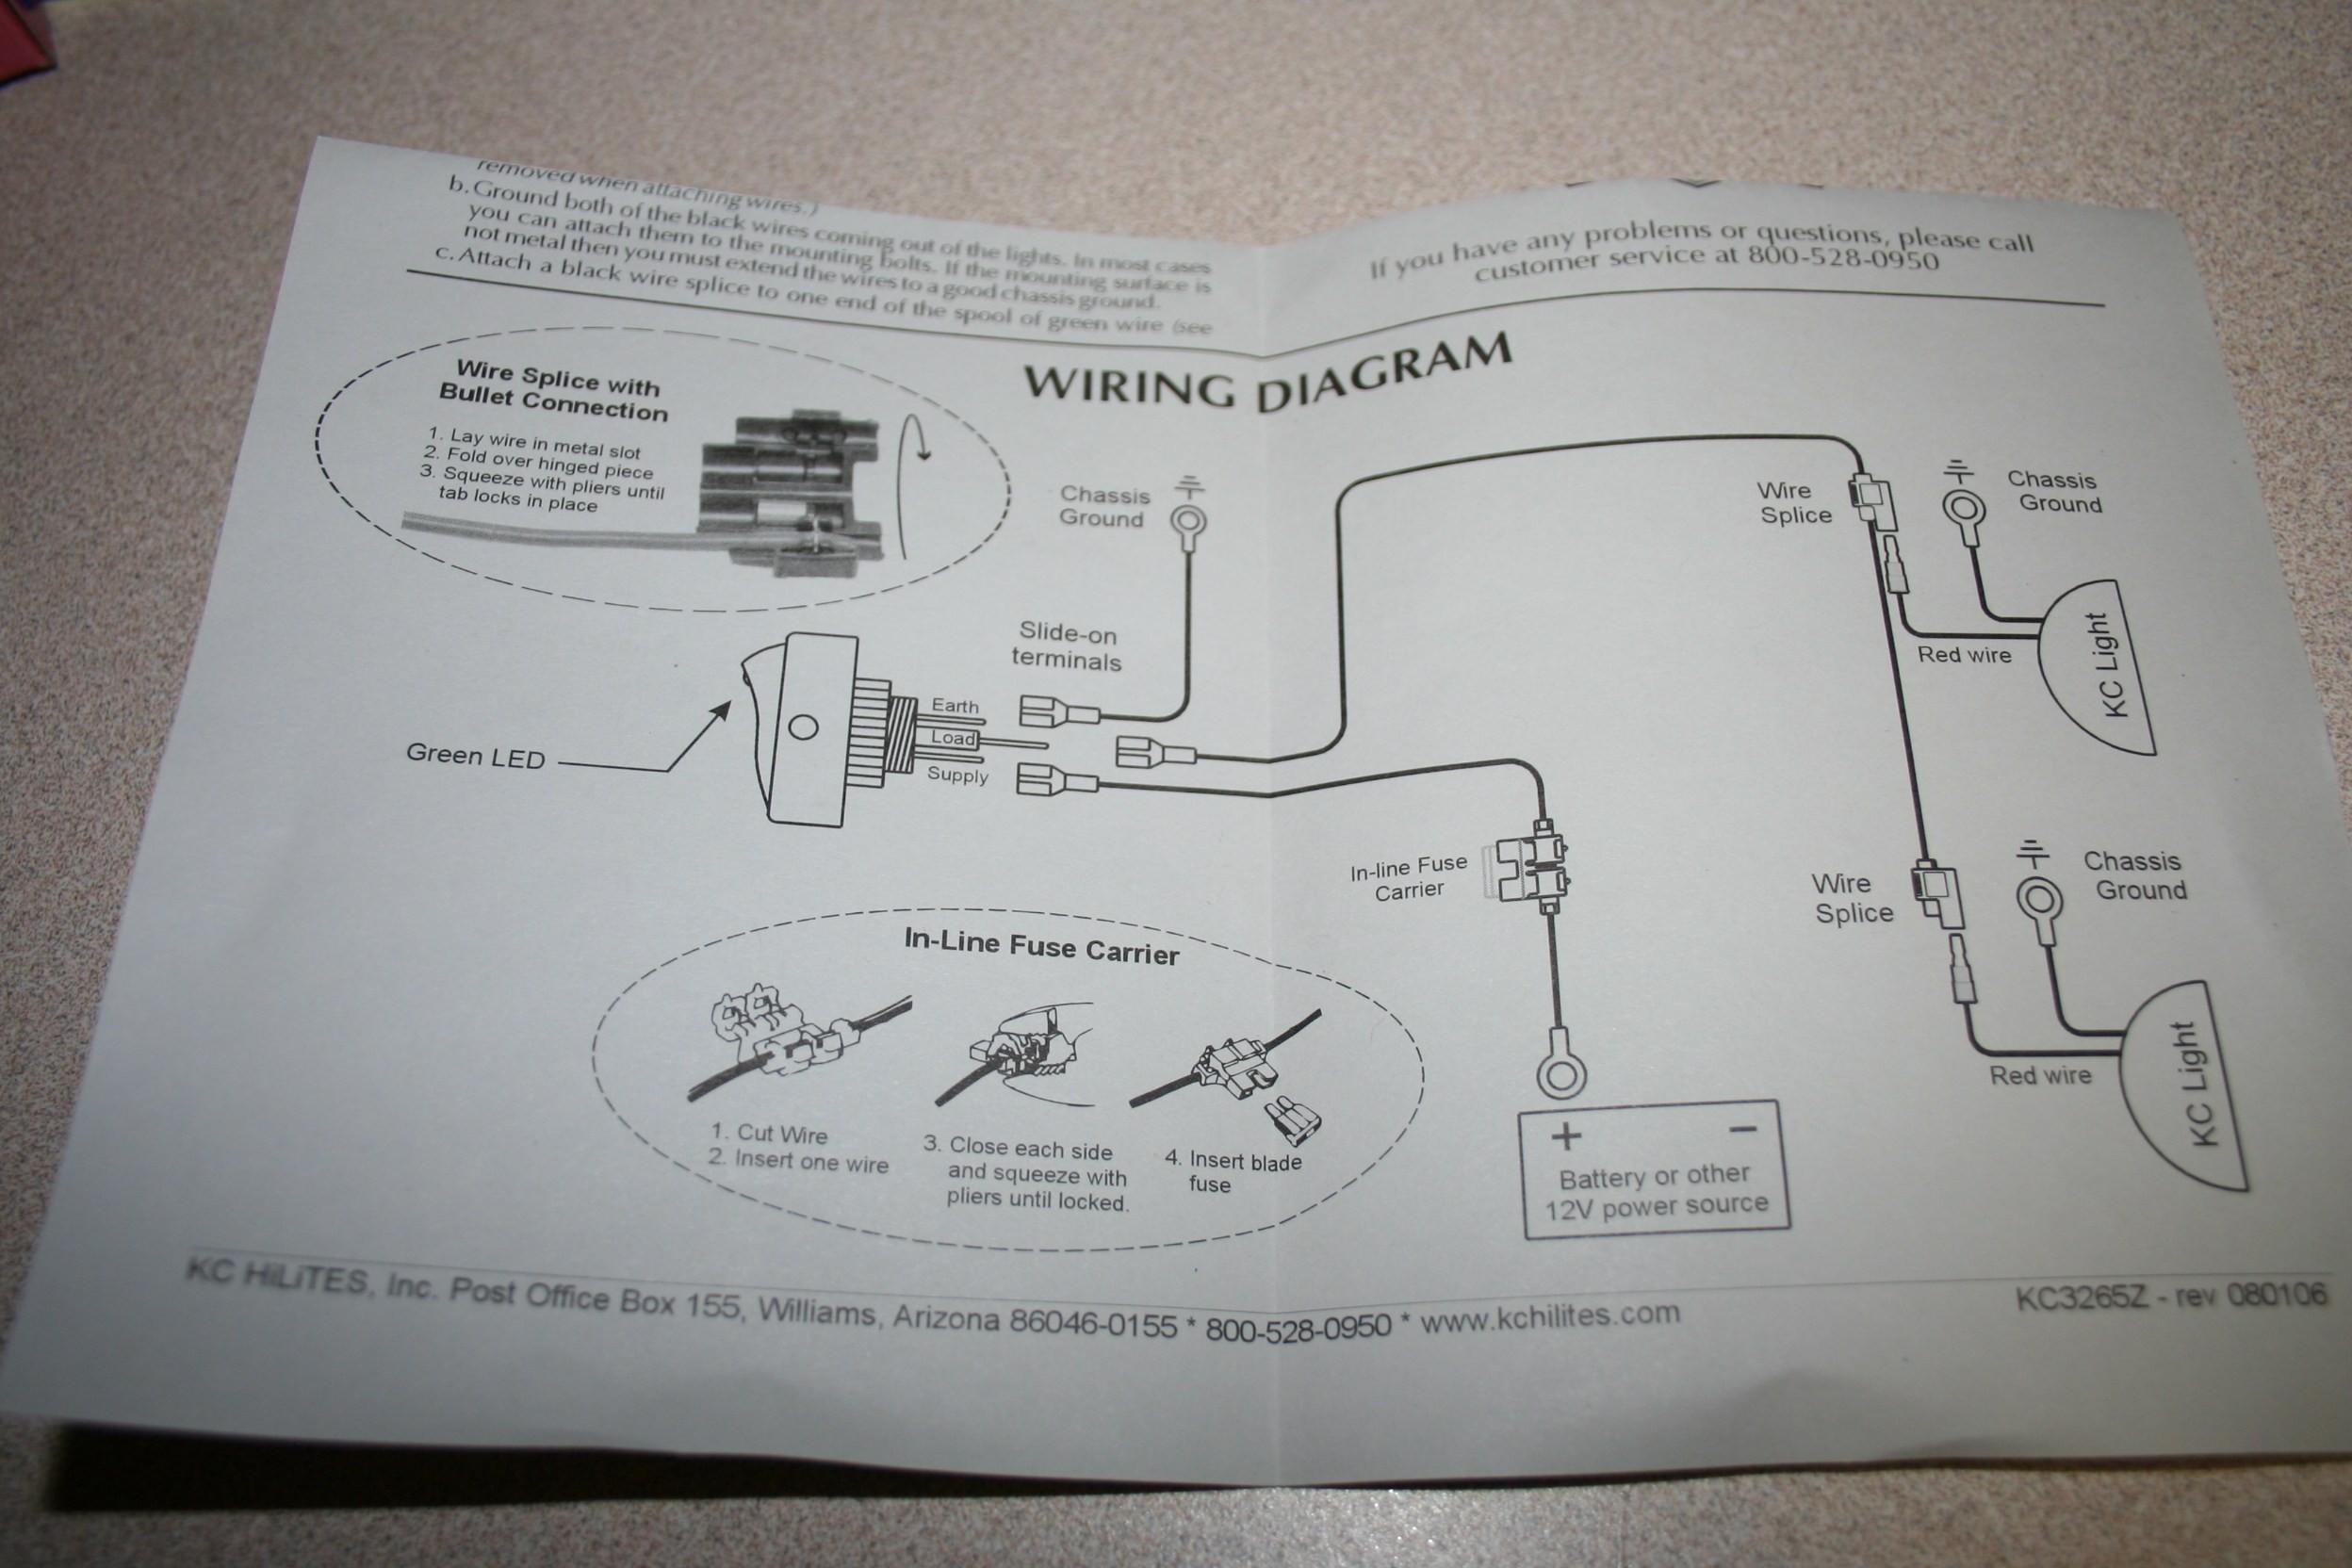 Kc Off Road Light Wiring Diagram | Wiring Liry Off Road Light Wiring Diagram on